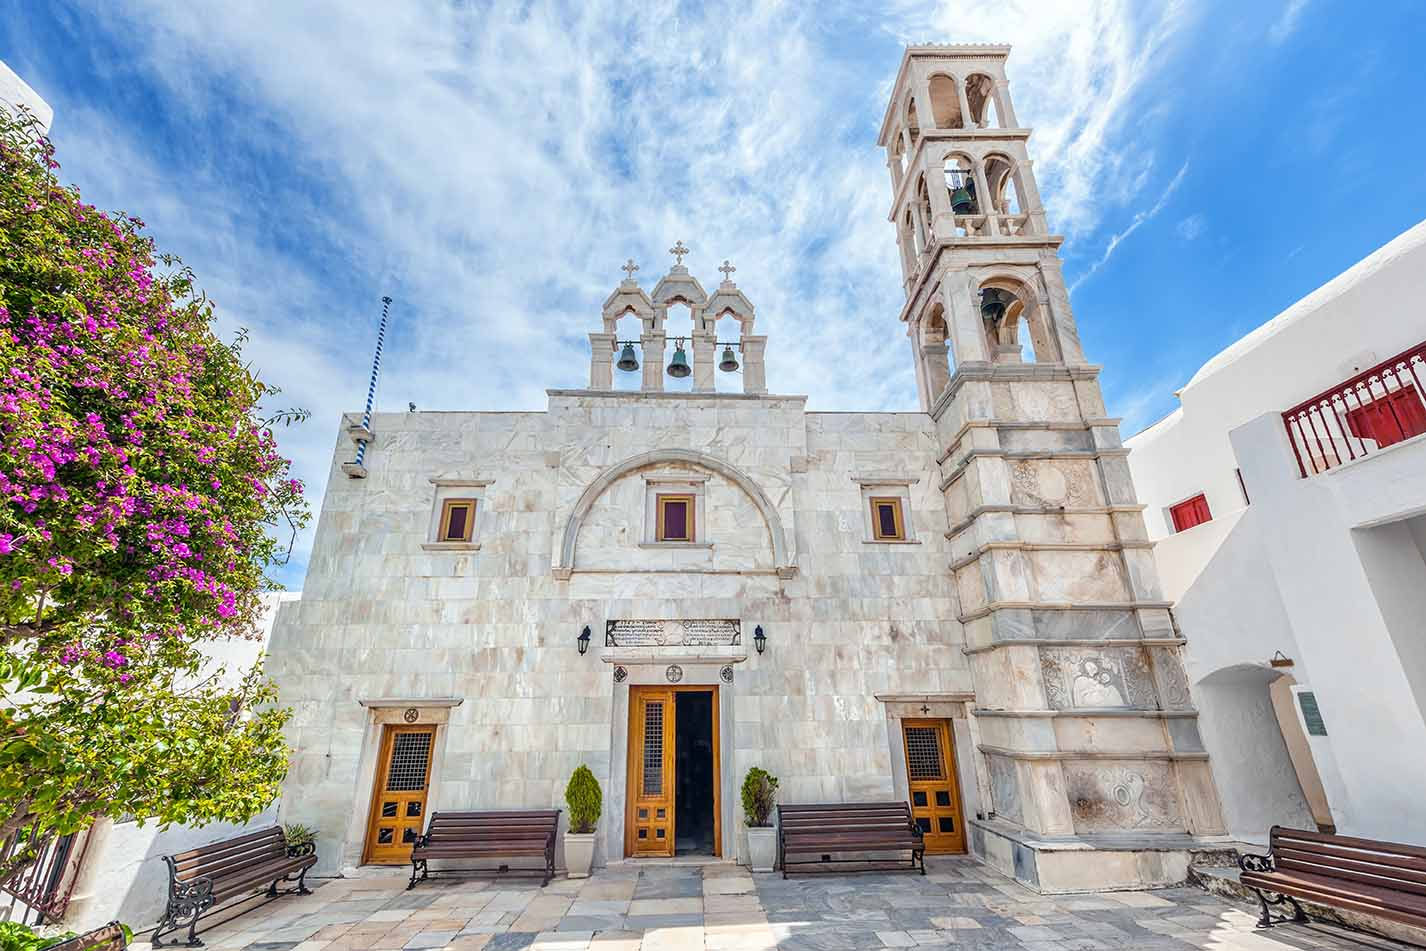 The monastery of Panagia Tourliani in Ano Mera, Mykonos (3)